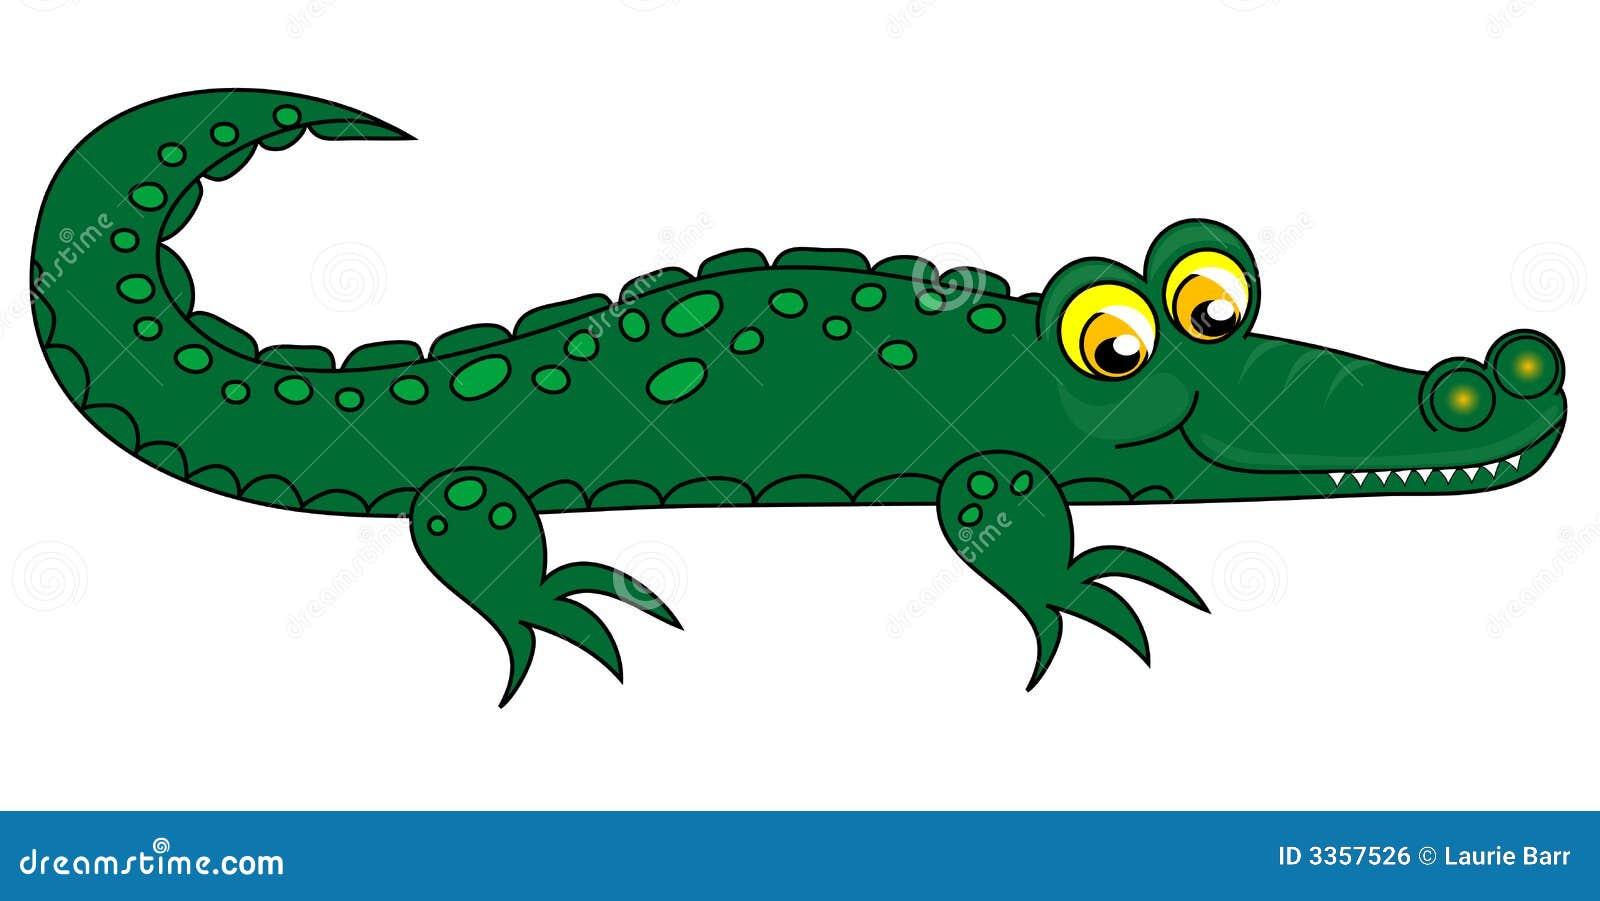 free animated alligator clipart - photo #45